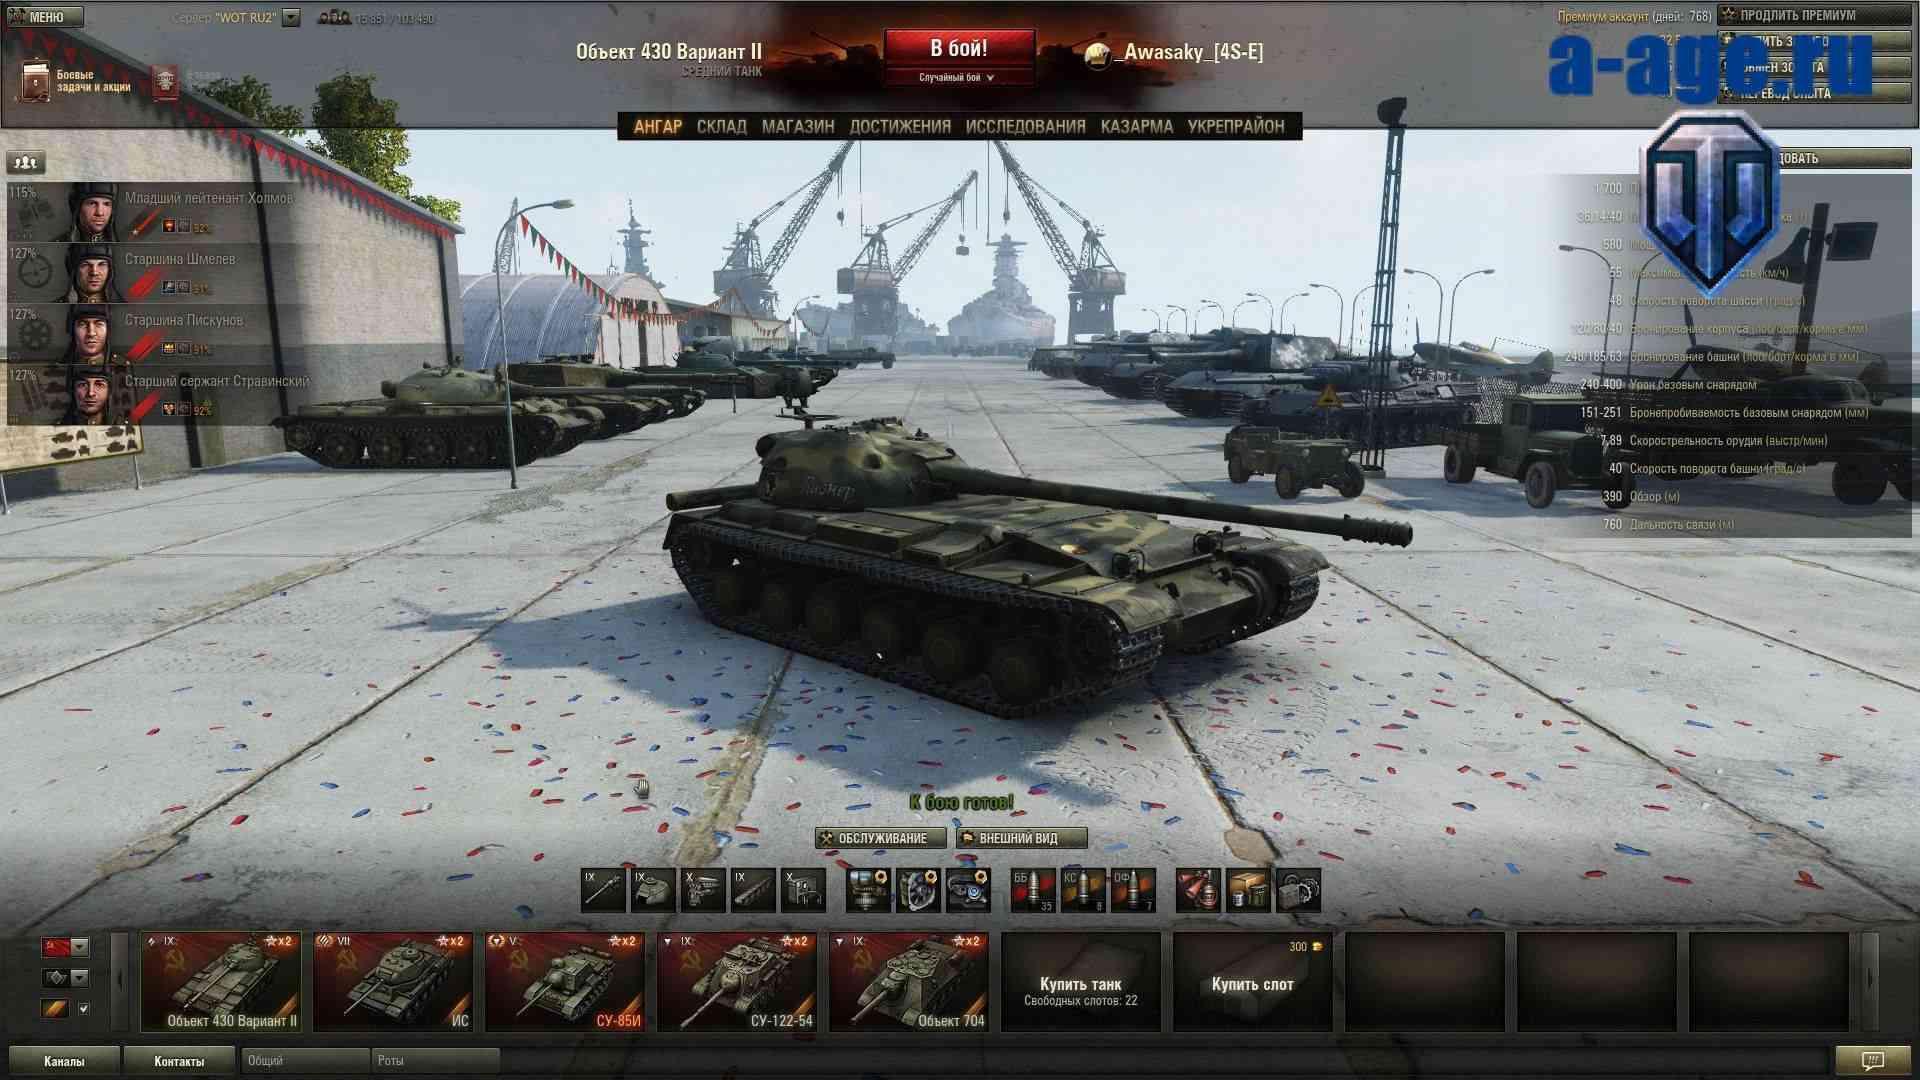 Праздничный ангар - вид на танки